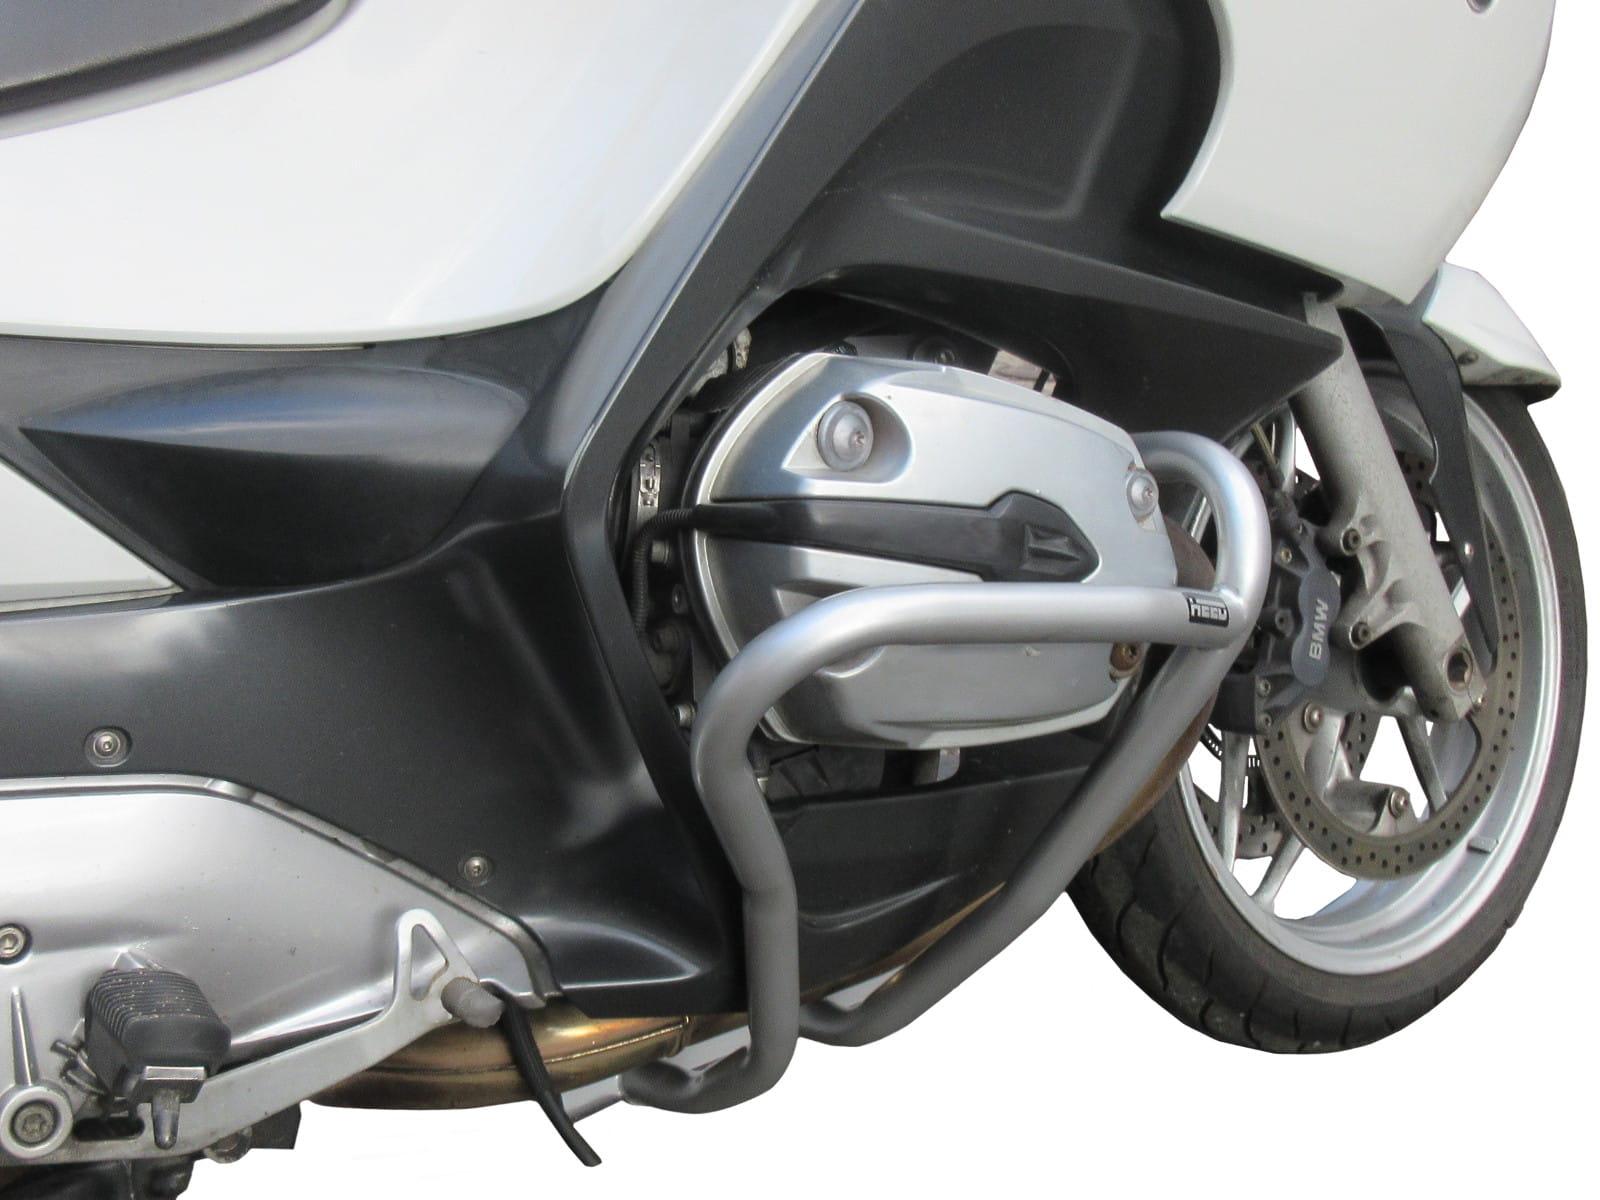 Engine Guard Rear Back Crash Bar Silver Protector Kit Fits BMW R1200RT 2005-2013